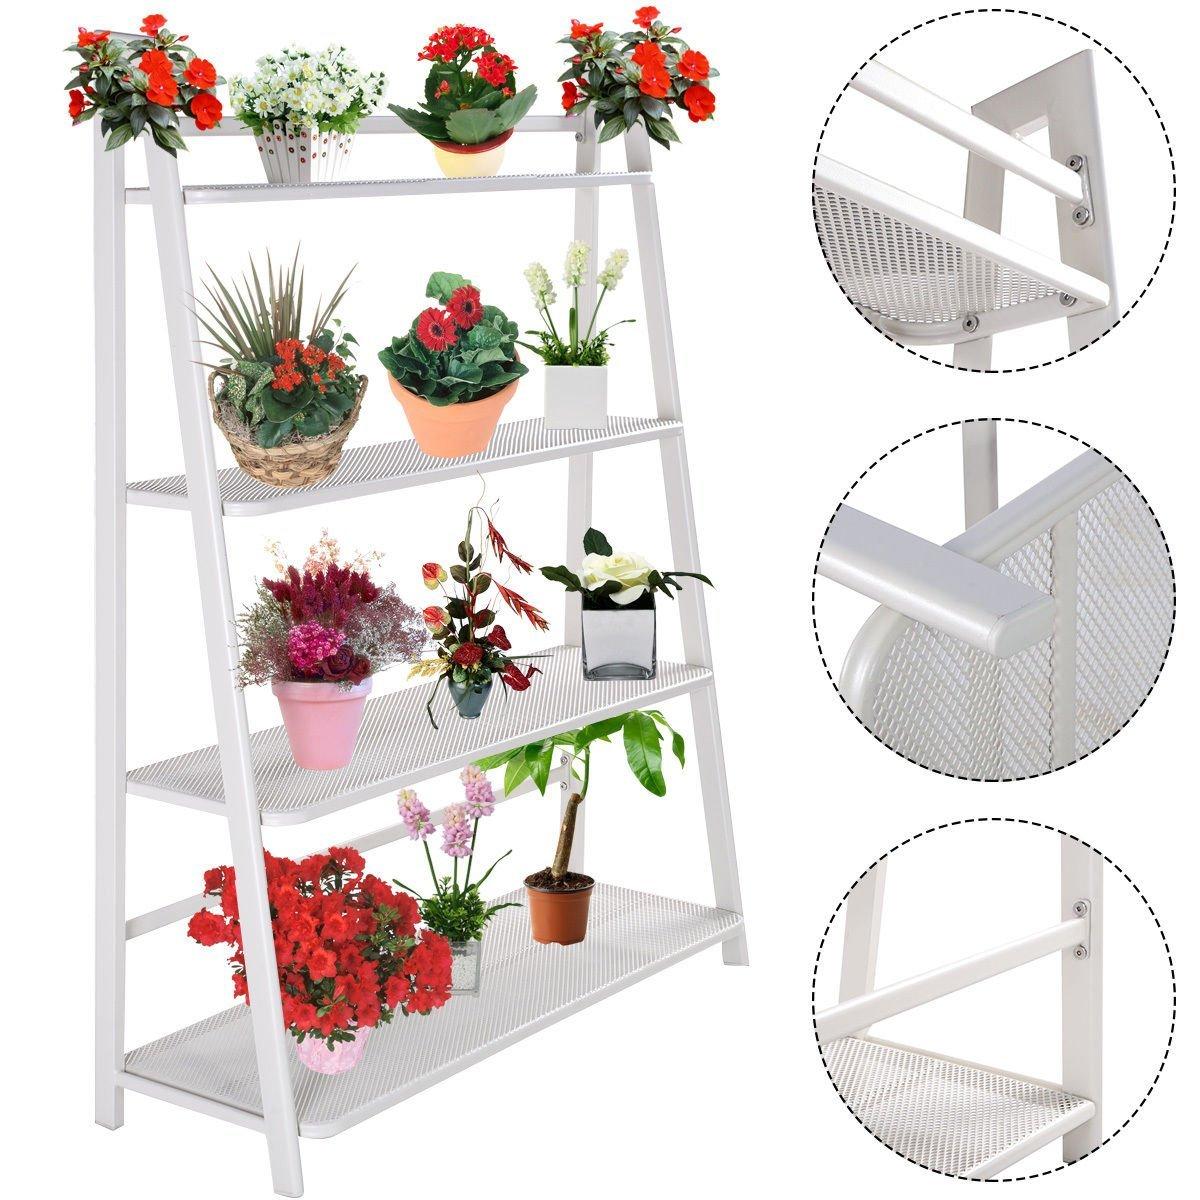 Cheap Cut Flower Display Stand Find Cut Flower Display Stand Deals